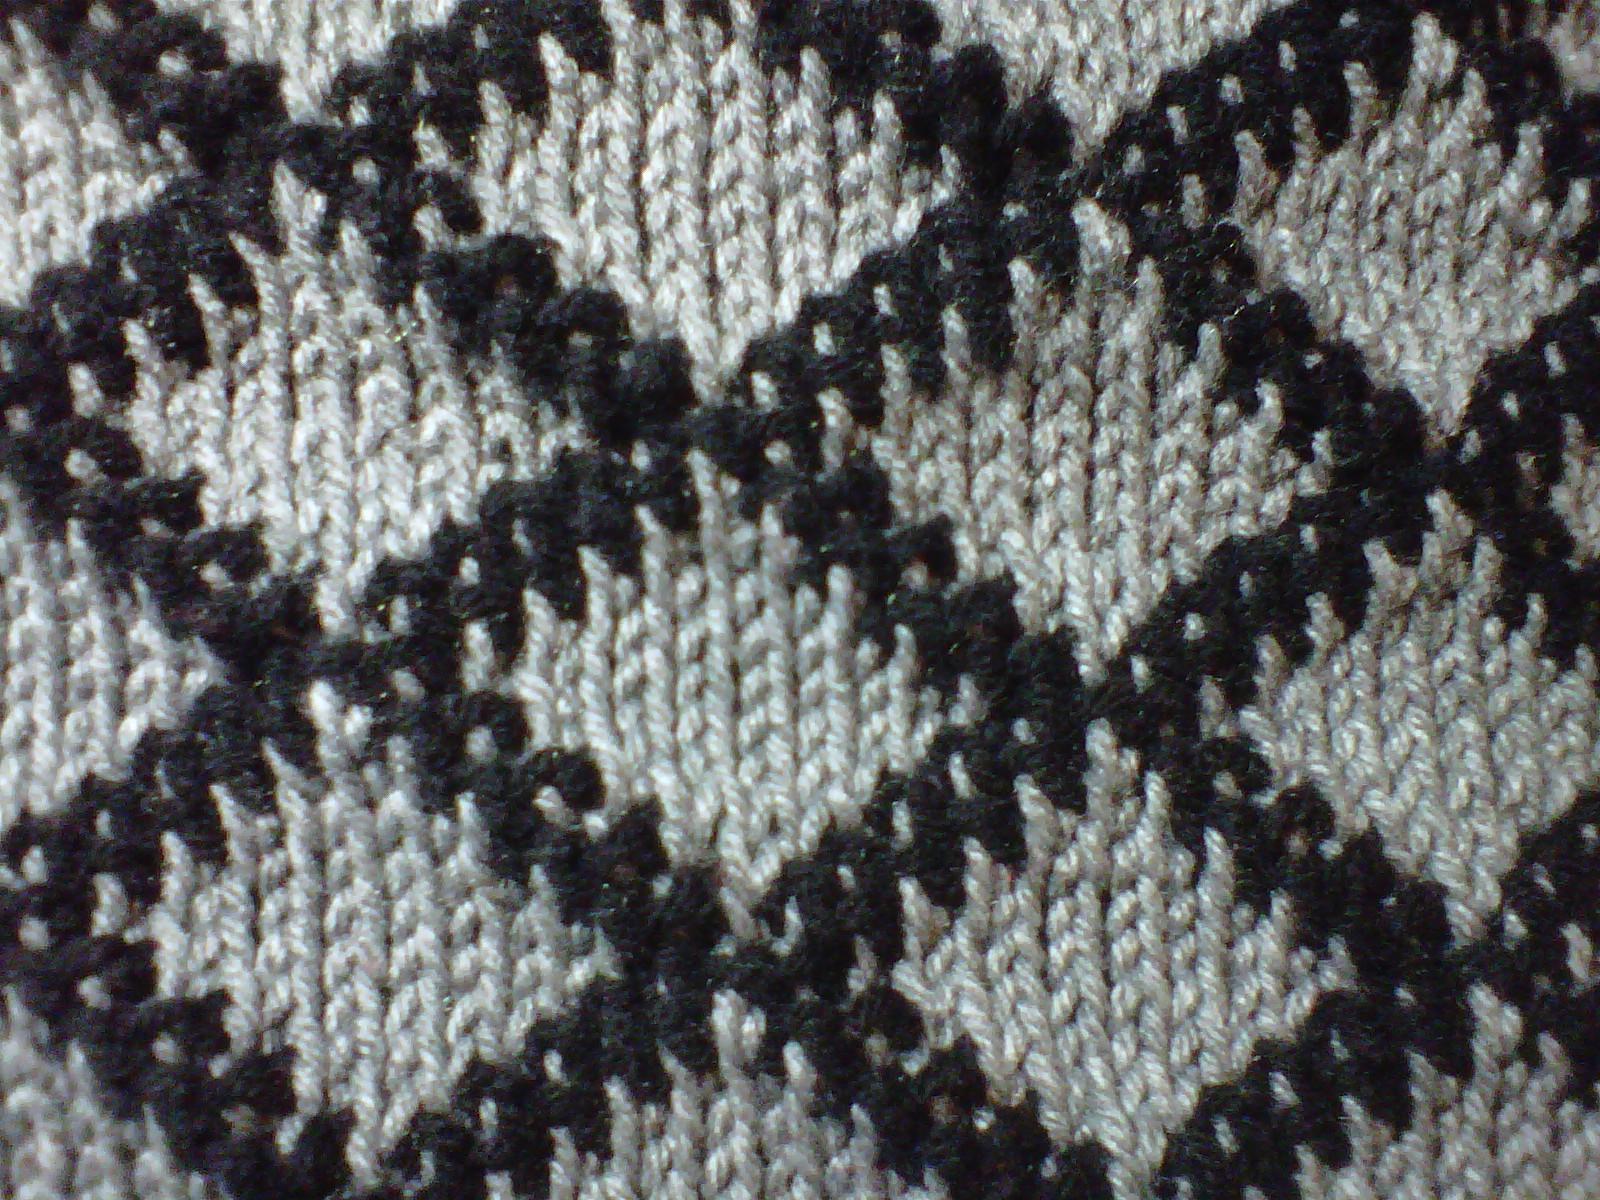 Patsy Harbor: Circular Tunisian Tapestry Fabric